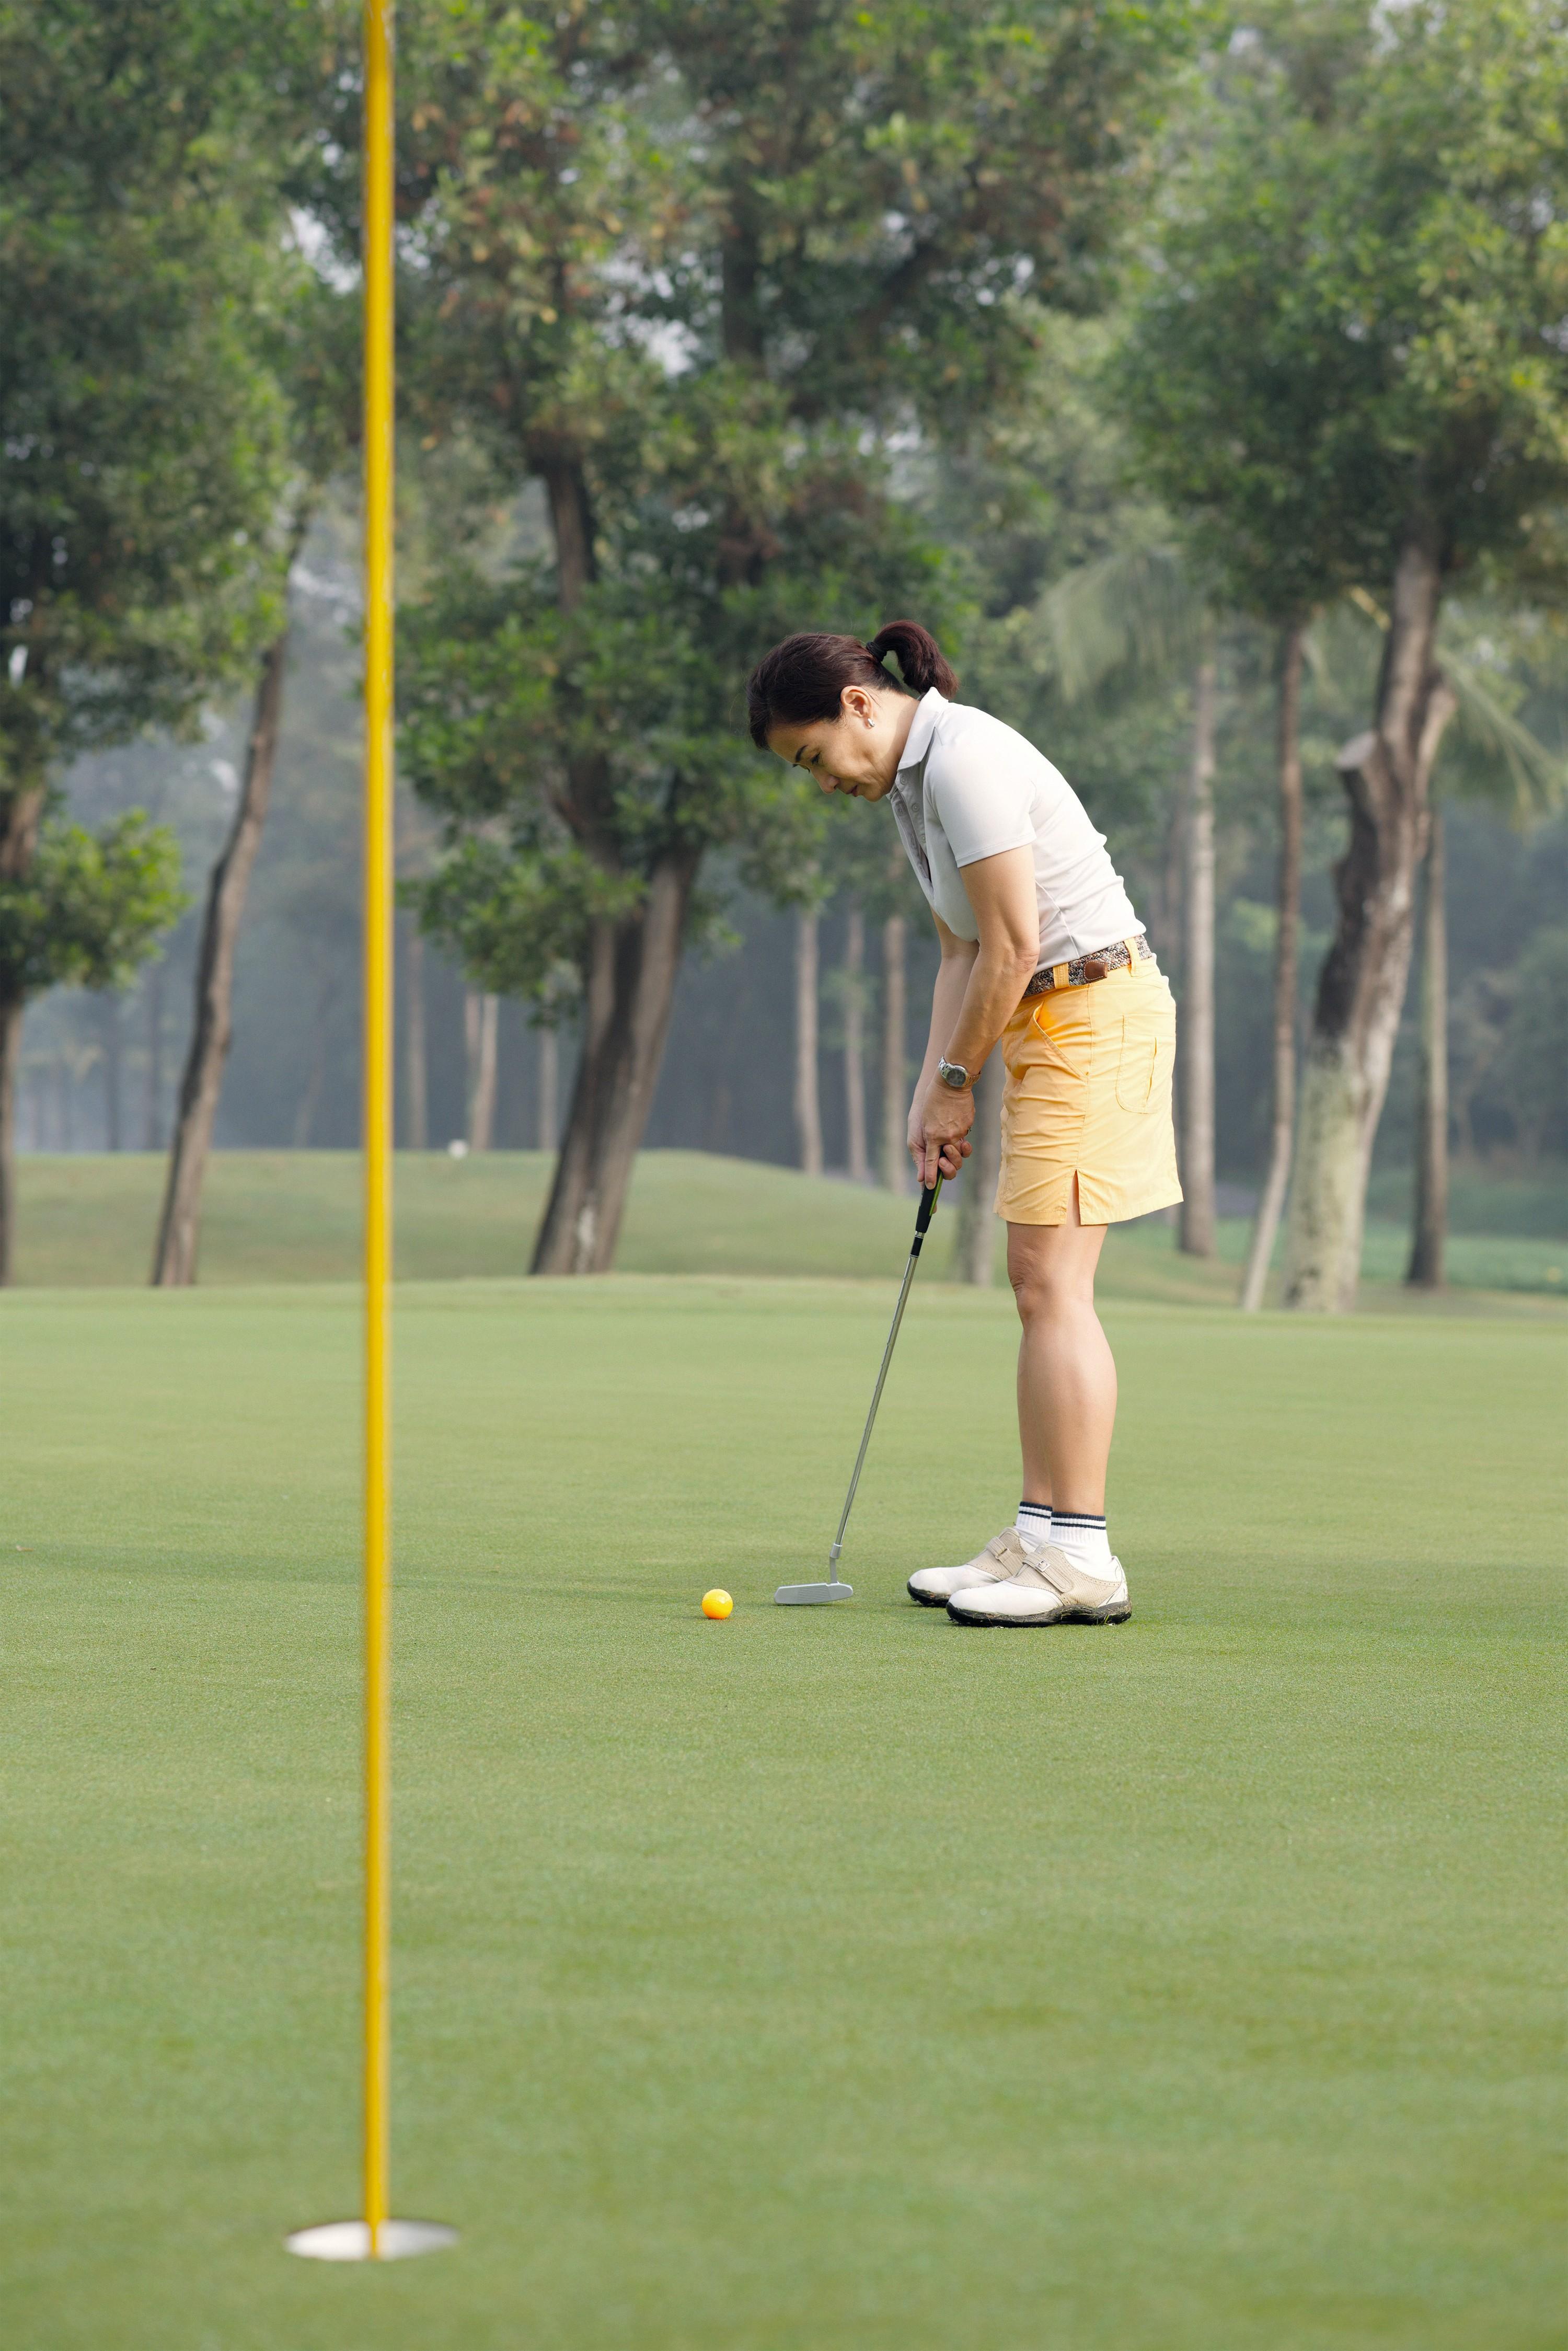 Exécution d'un putt au golf